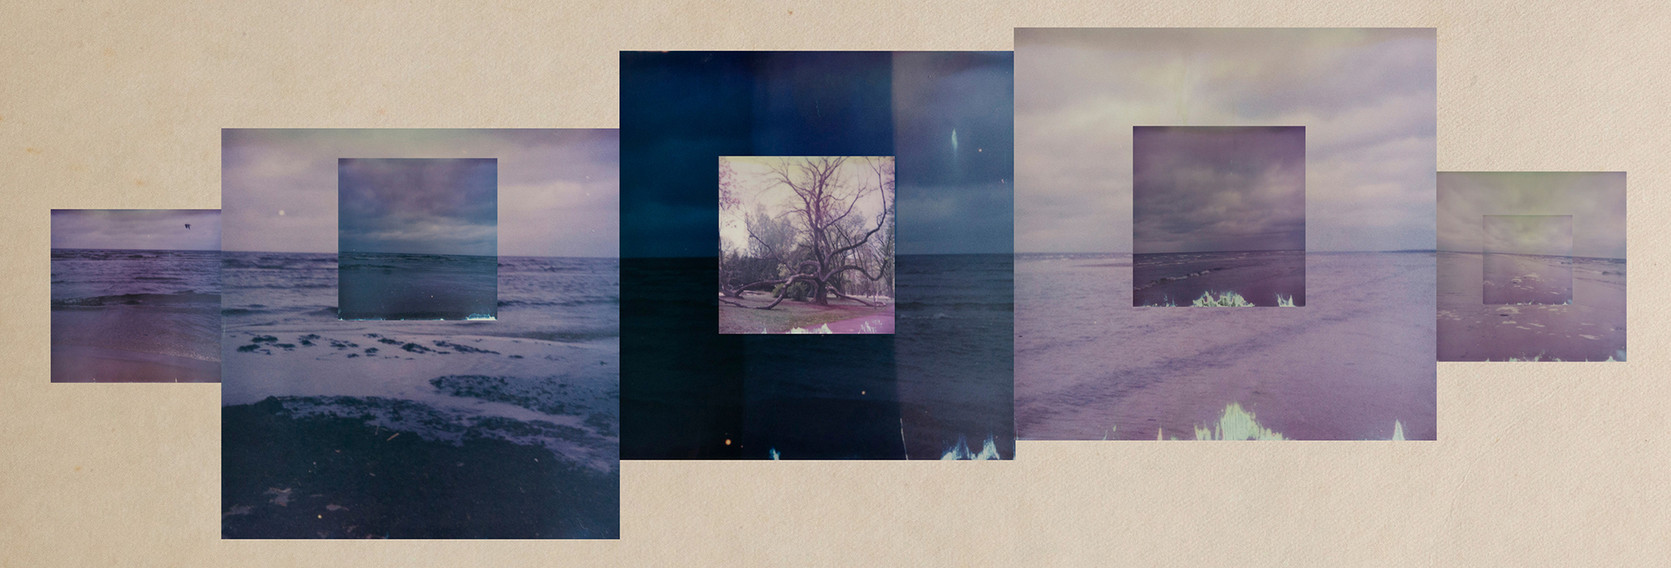 03_Ulysses.jpg